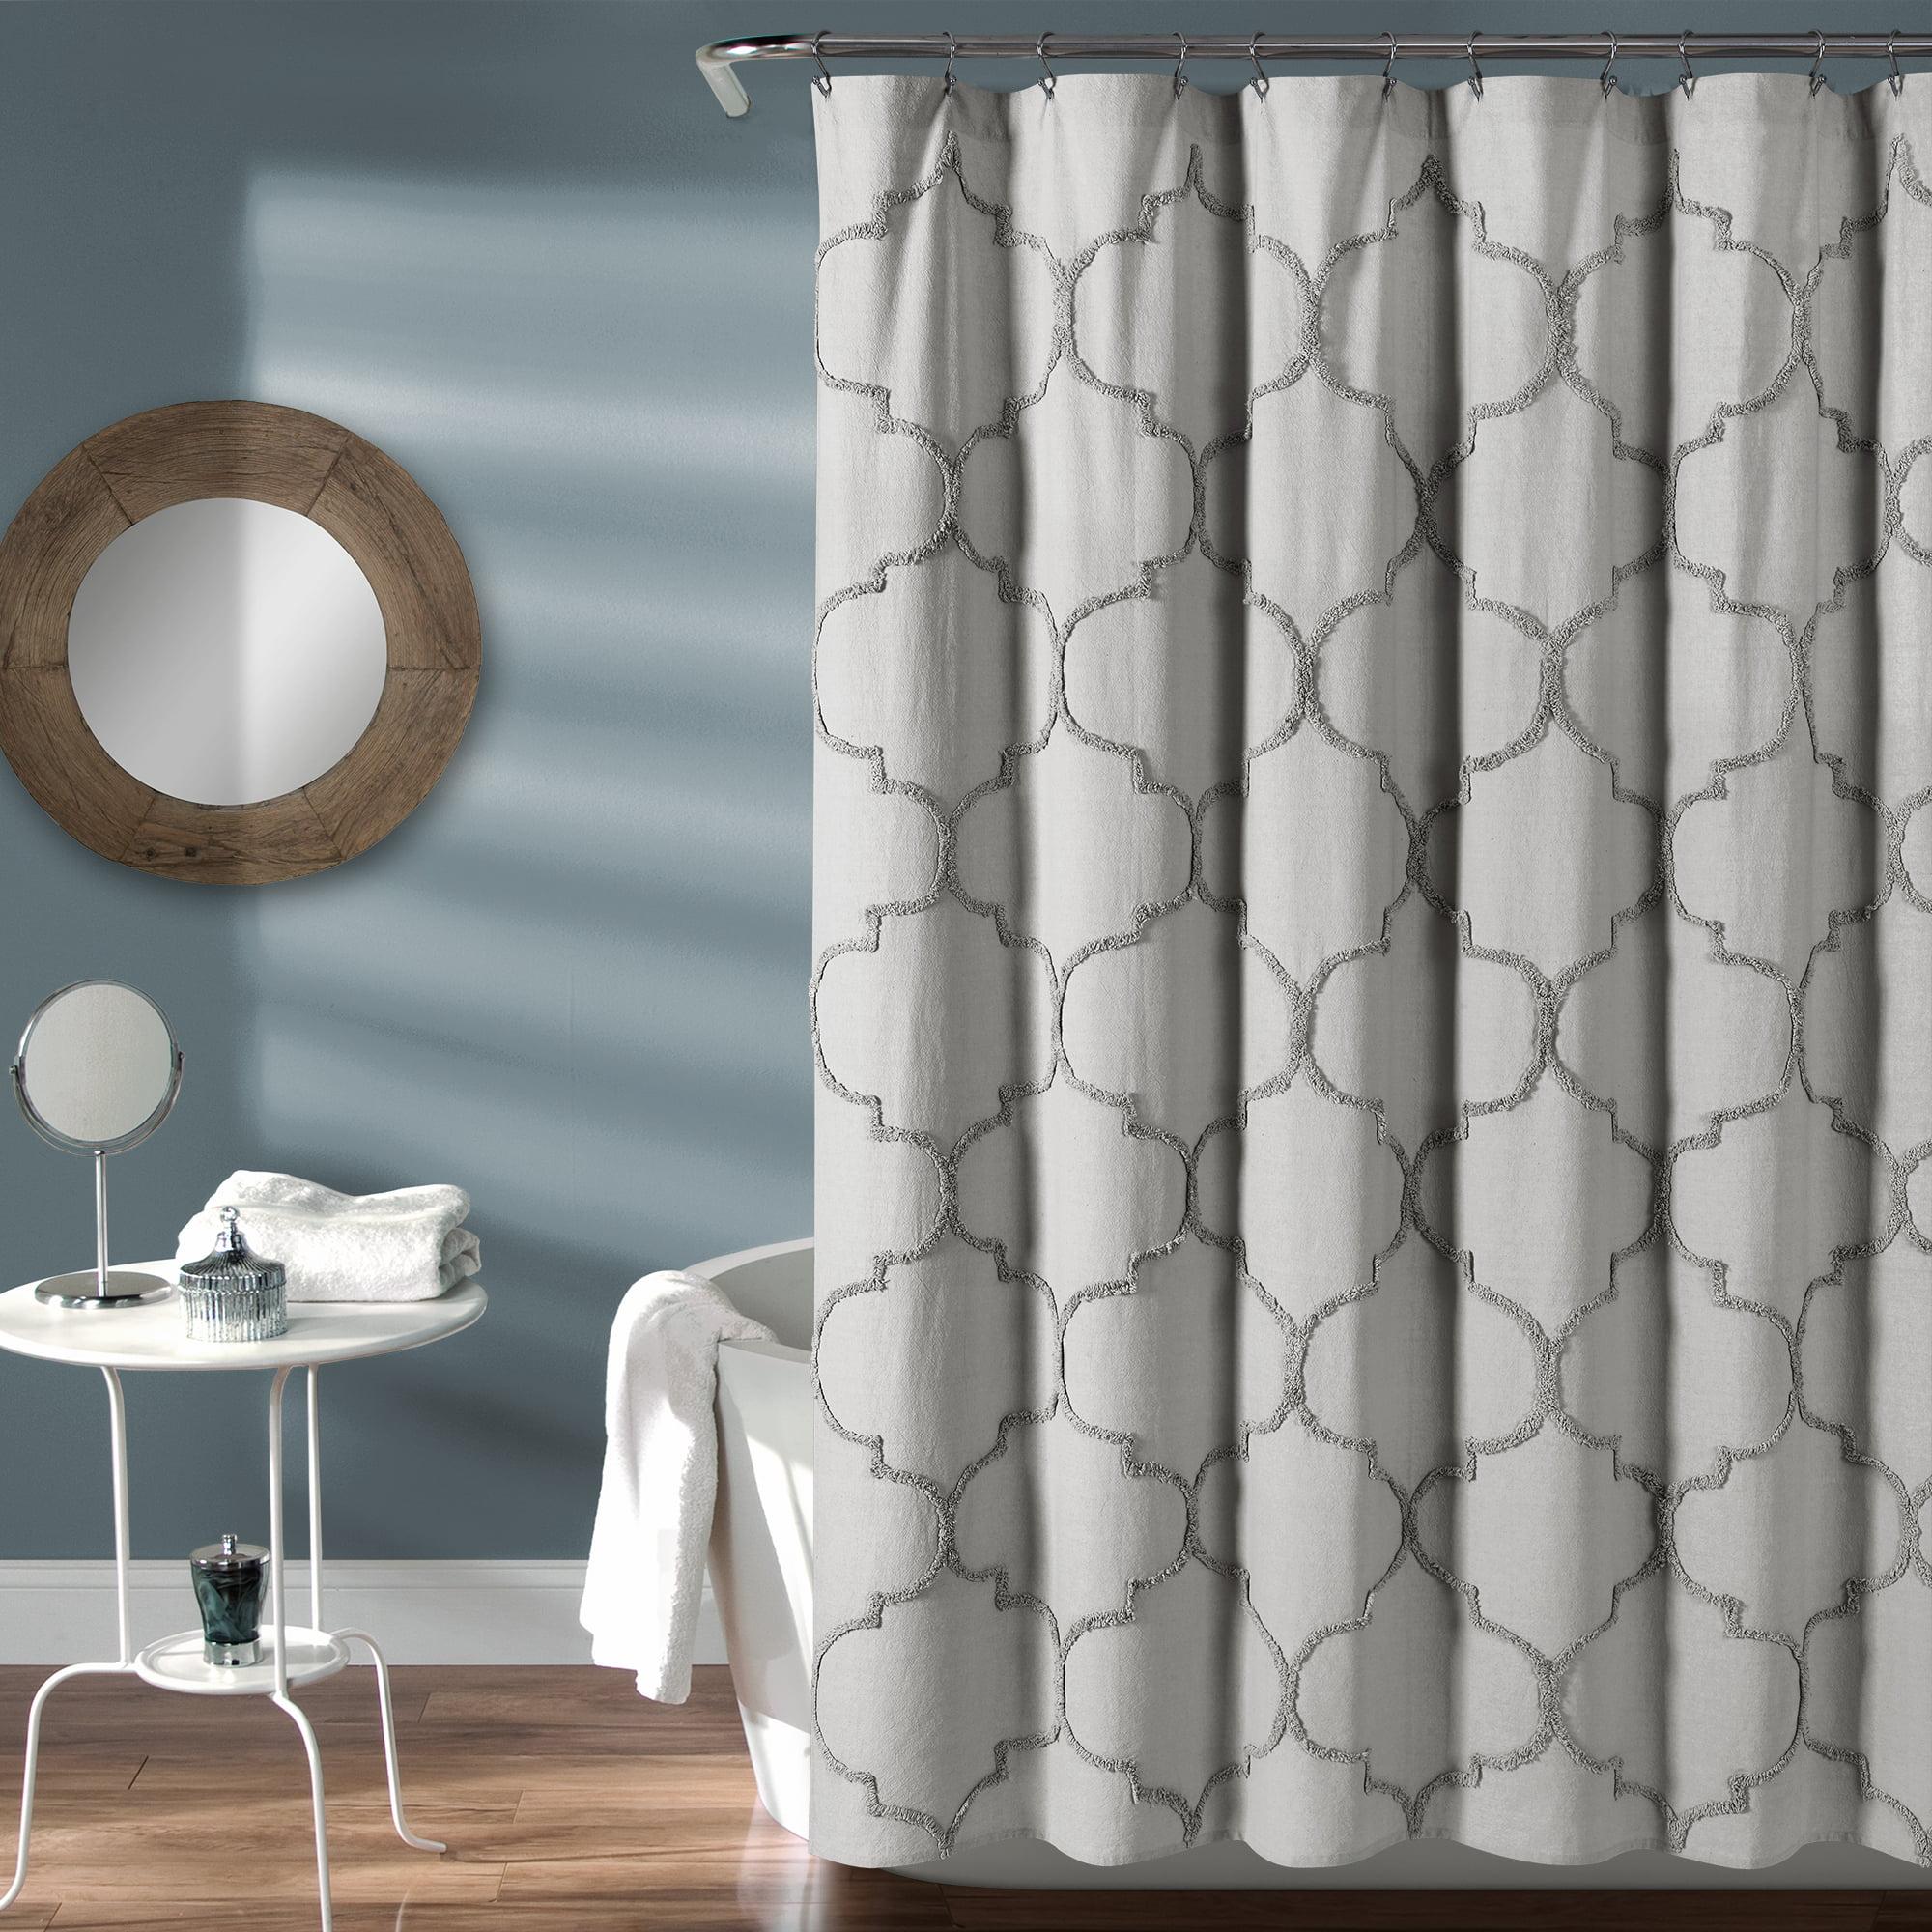 lush decor avon chenille trellis textured cotton shower curtain 72x72 light gray single